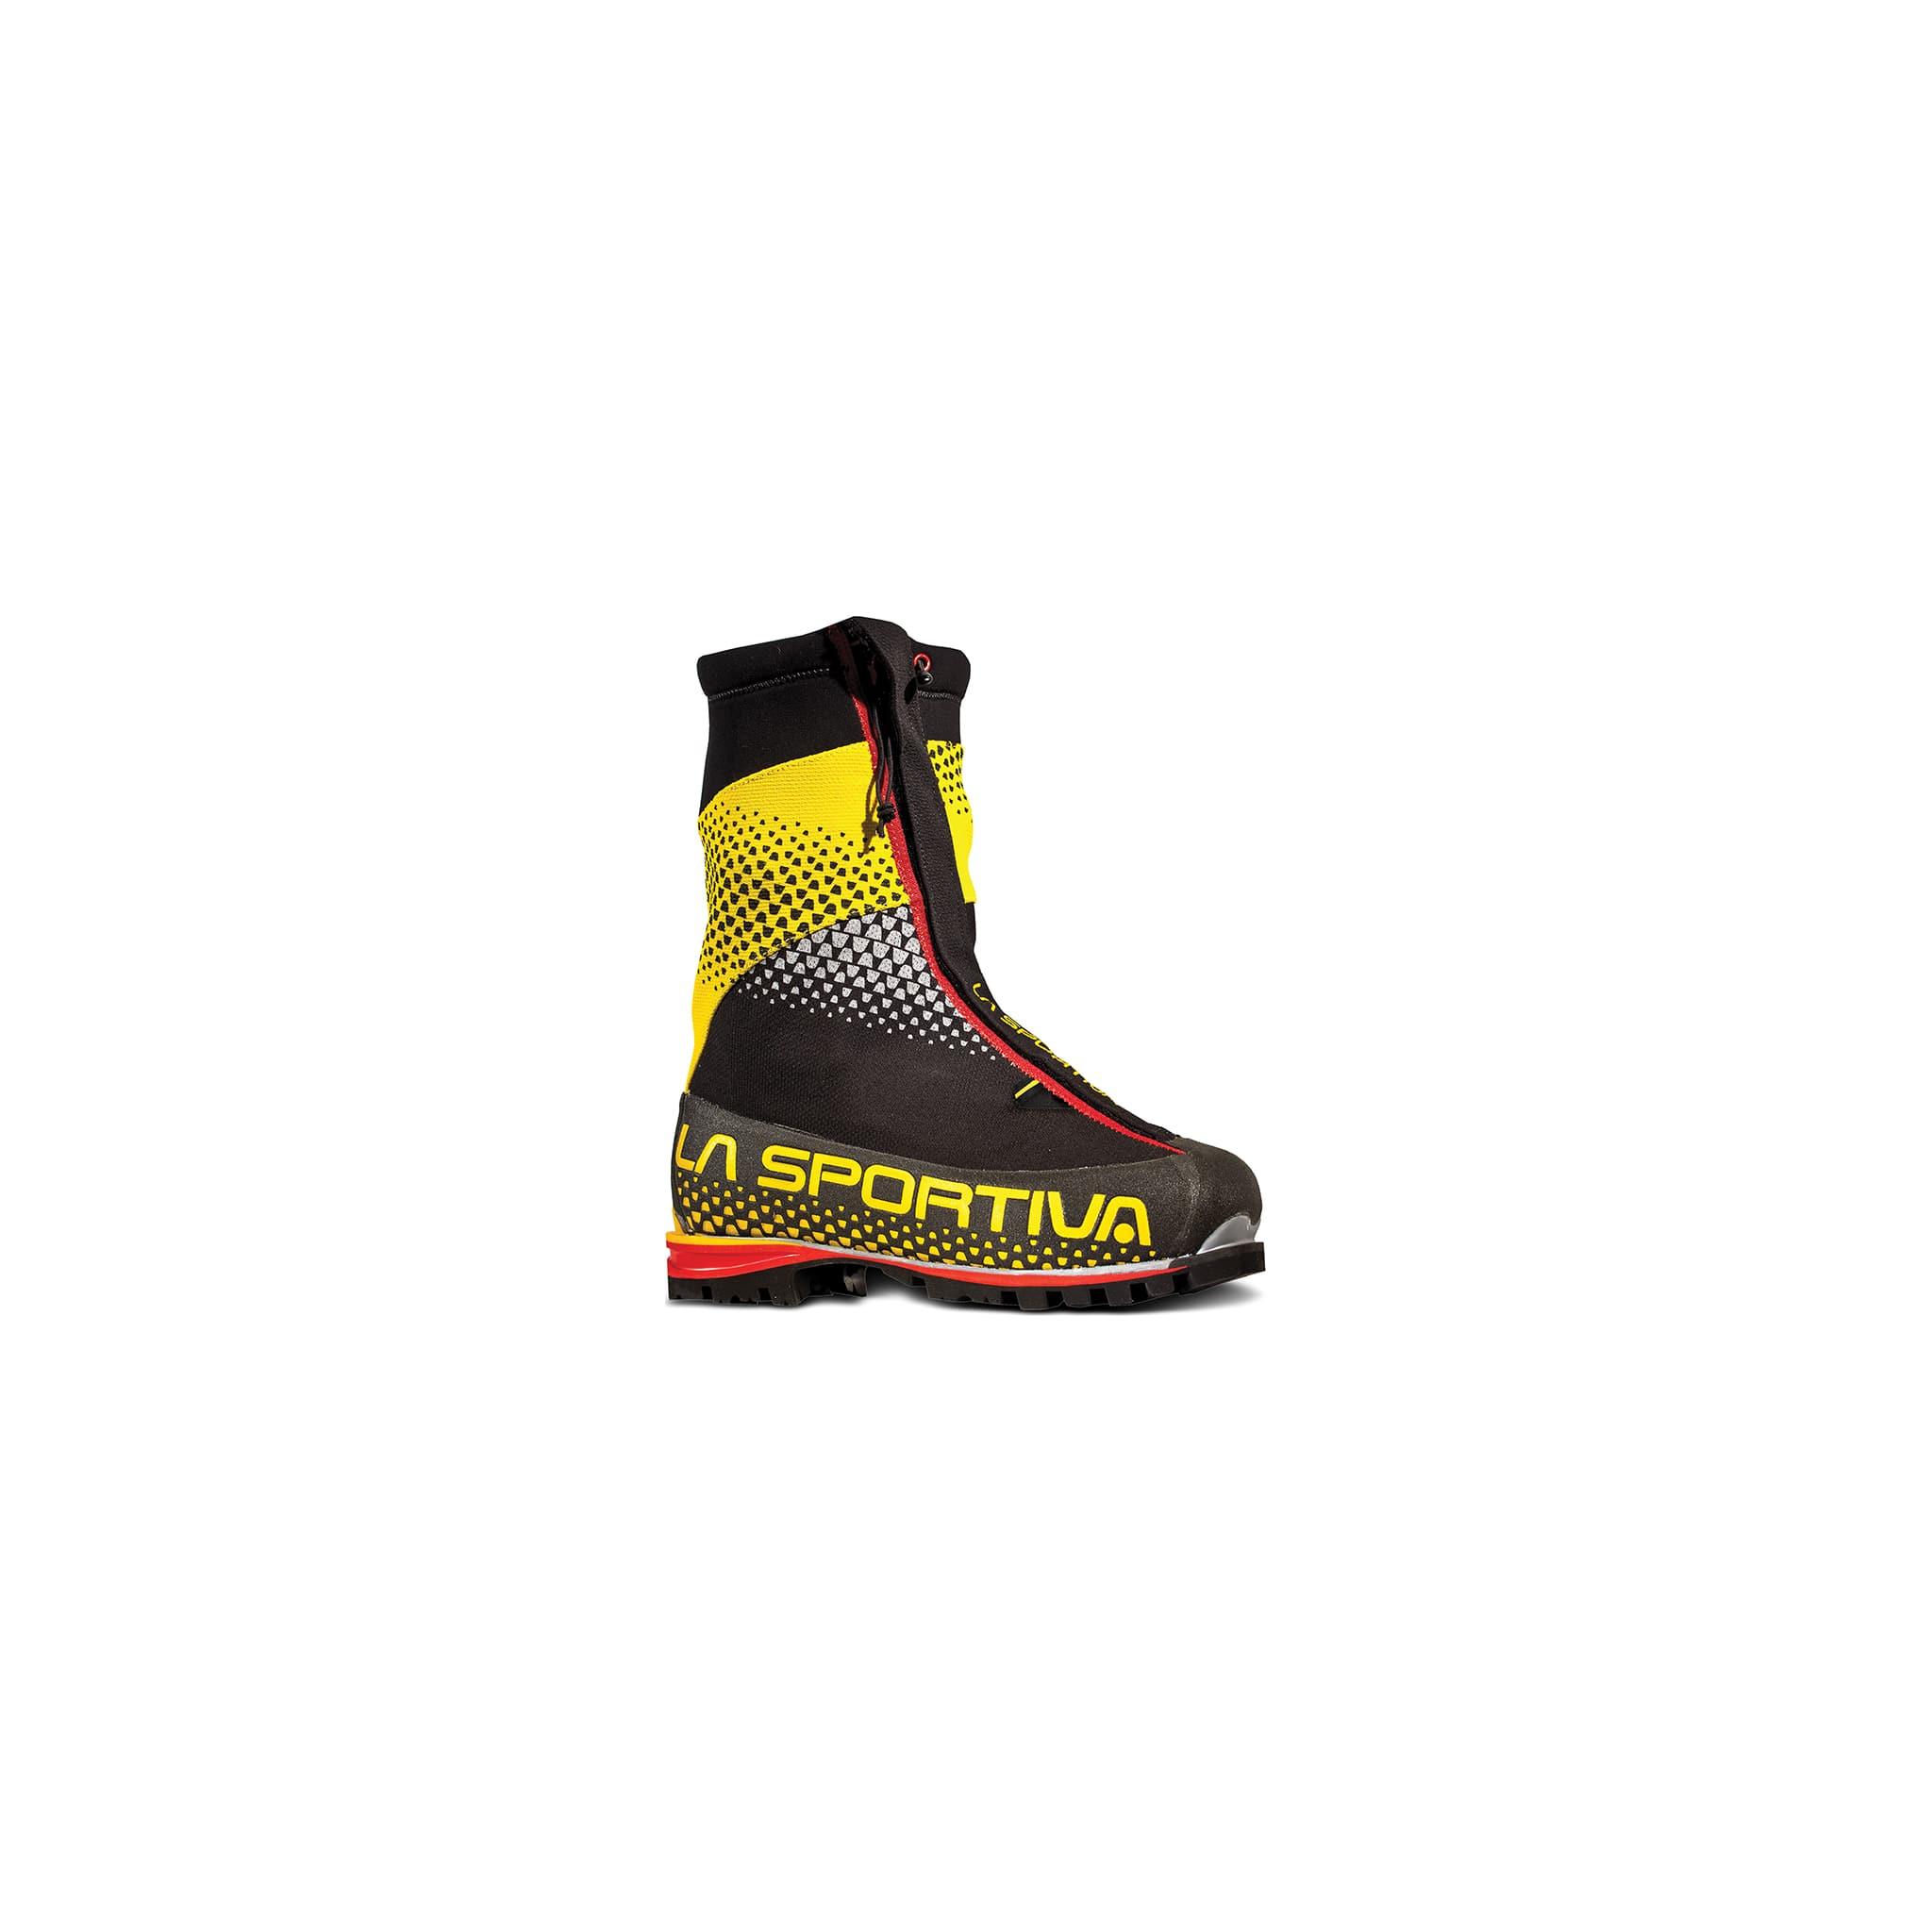 Fantastisk sko for isklatring og vinteralpinisme!!